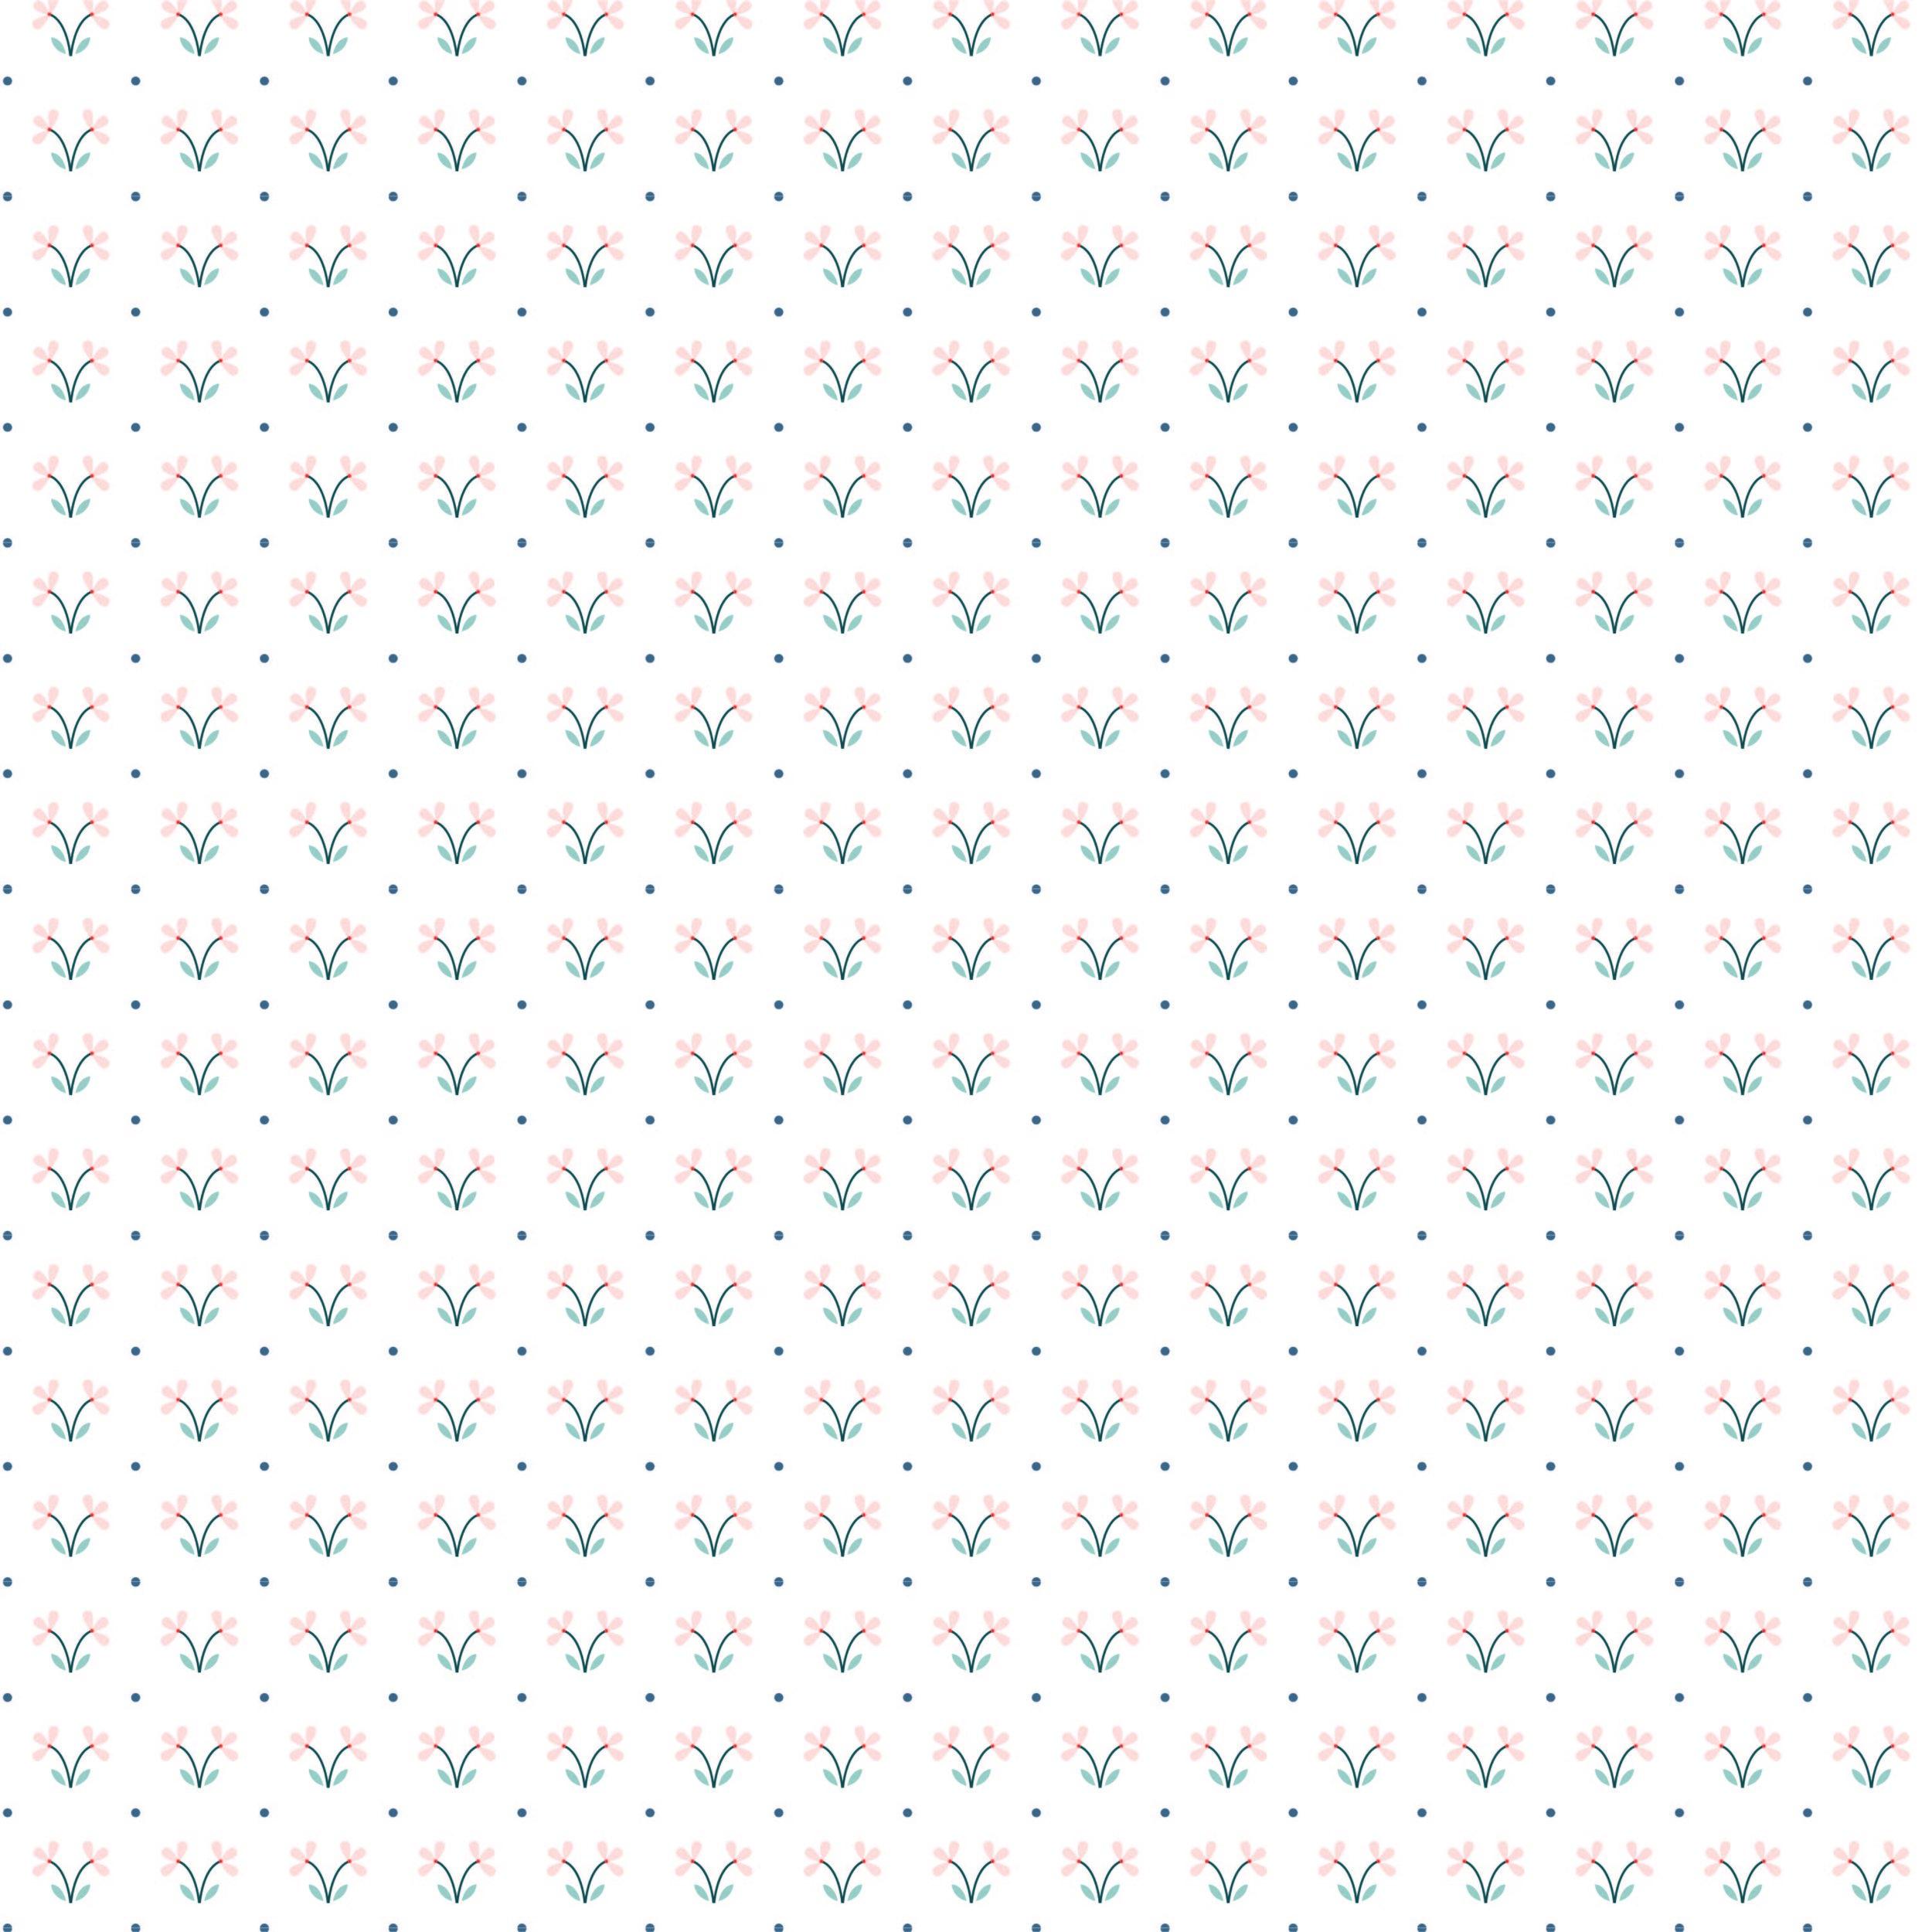 patterns for texas-08.jpg